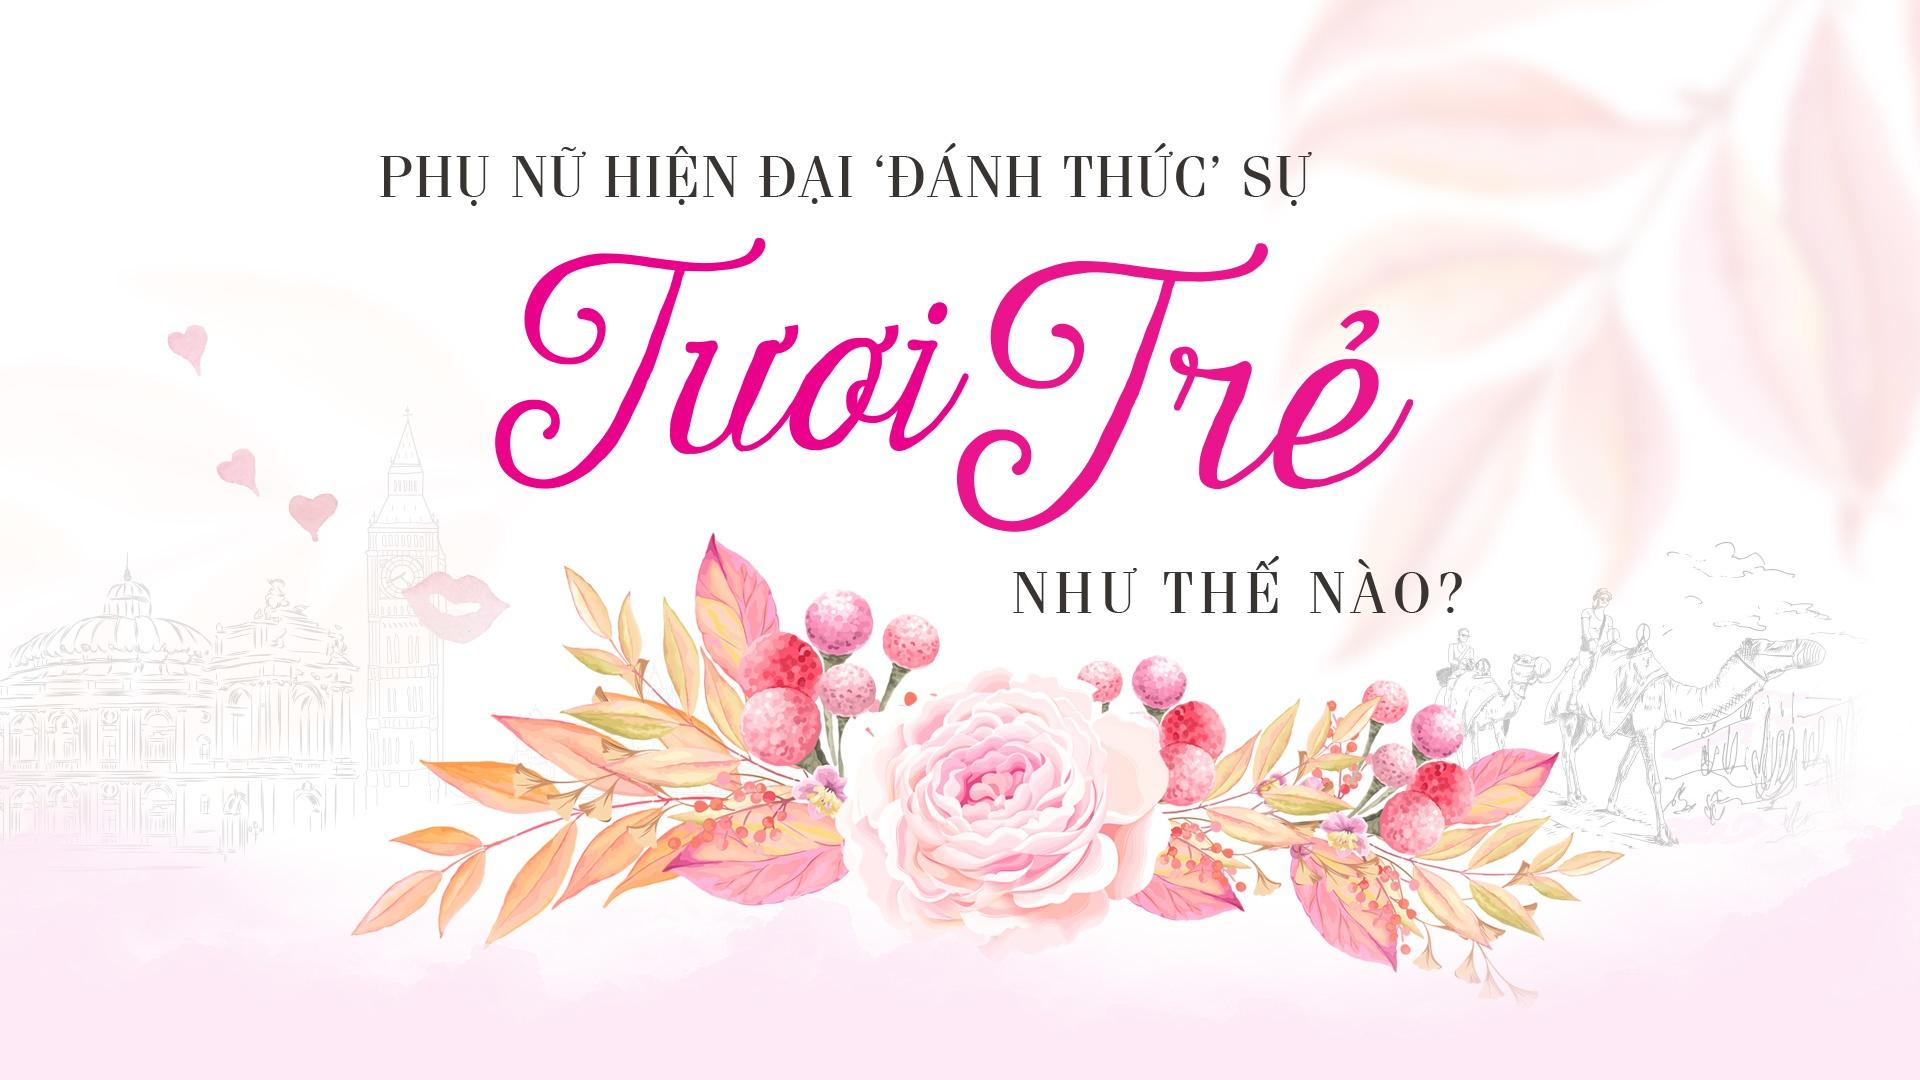 Phu nu hien dai 'danh thuc' su tuoi tre nhu the nao? hinh anh 2